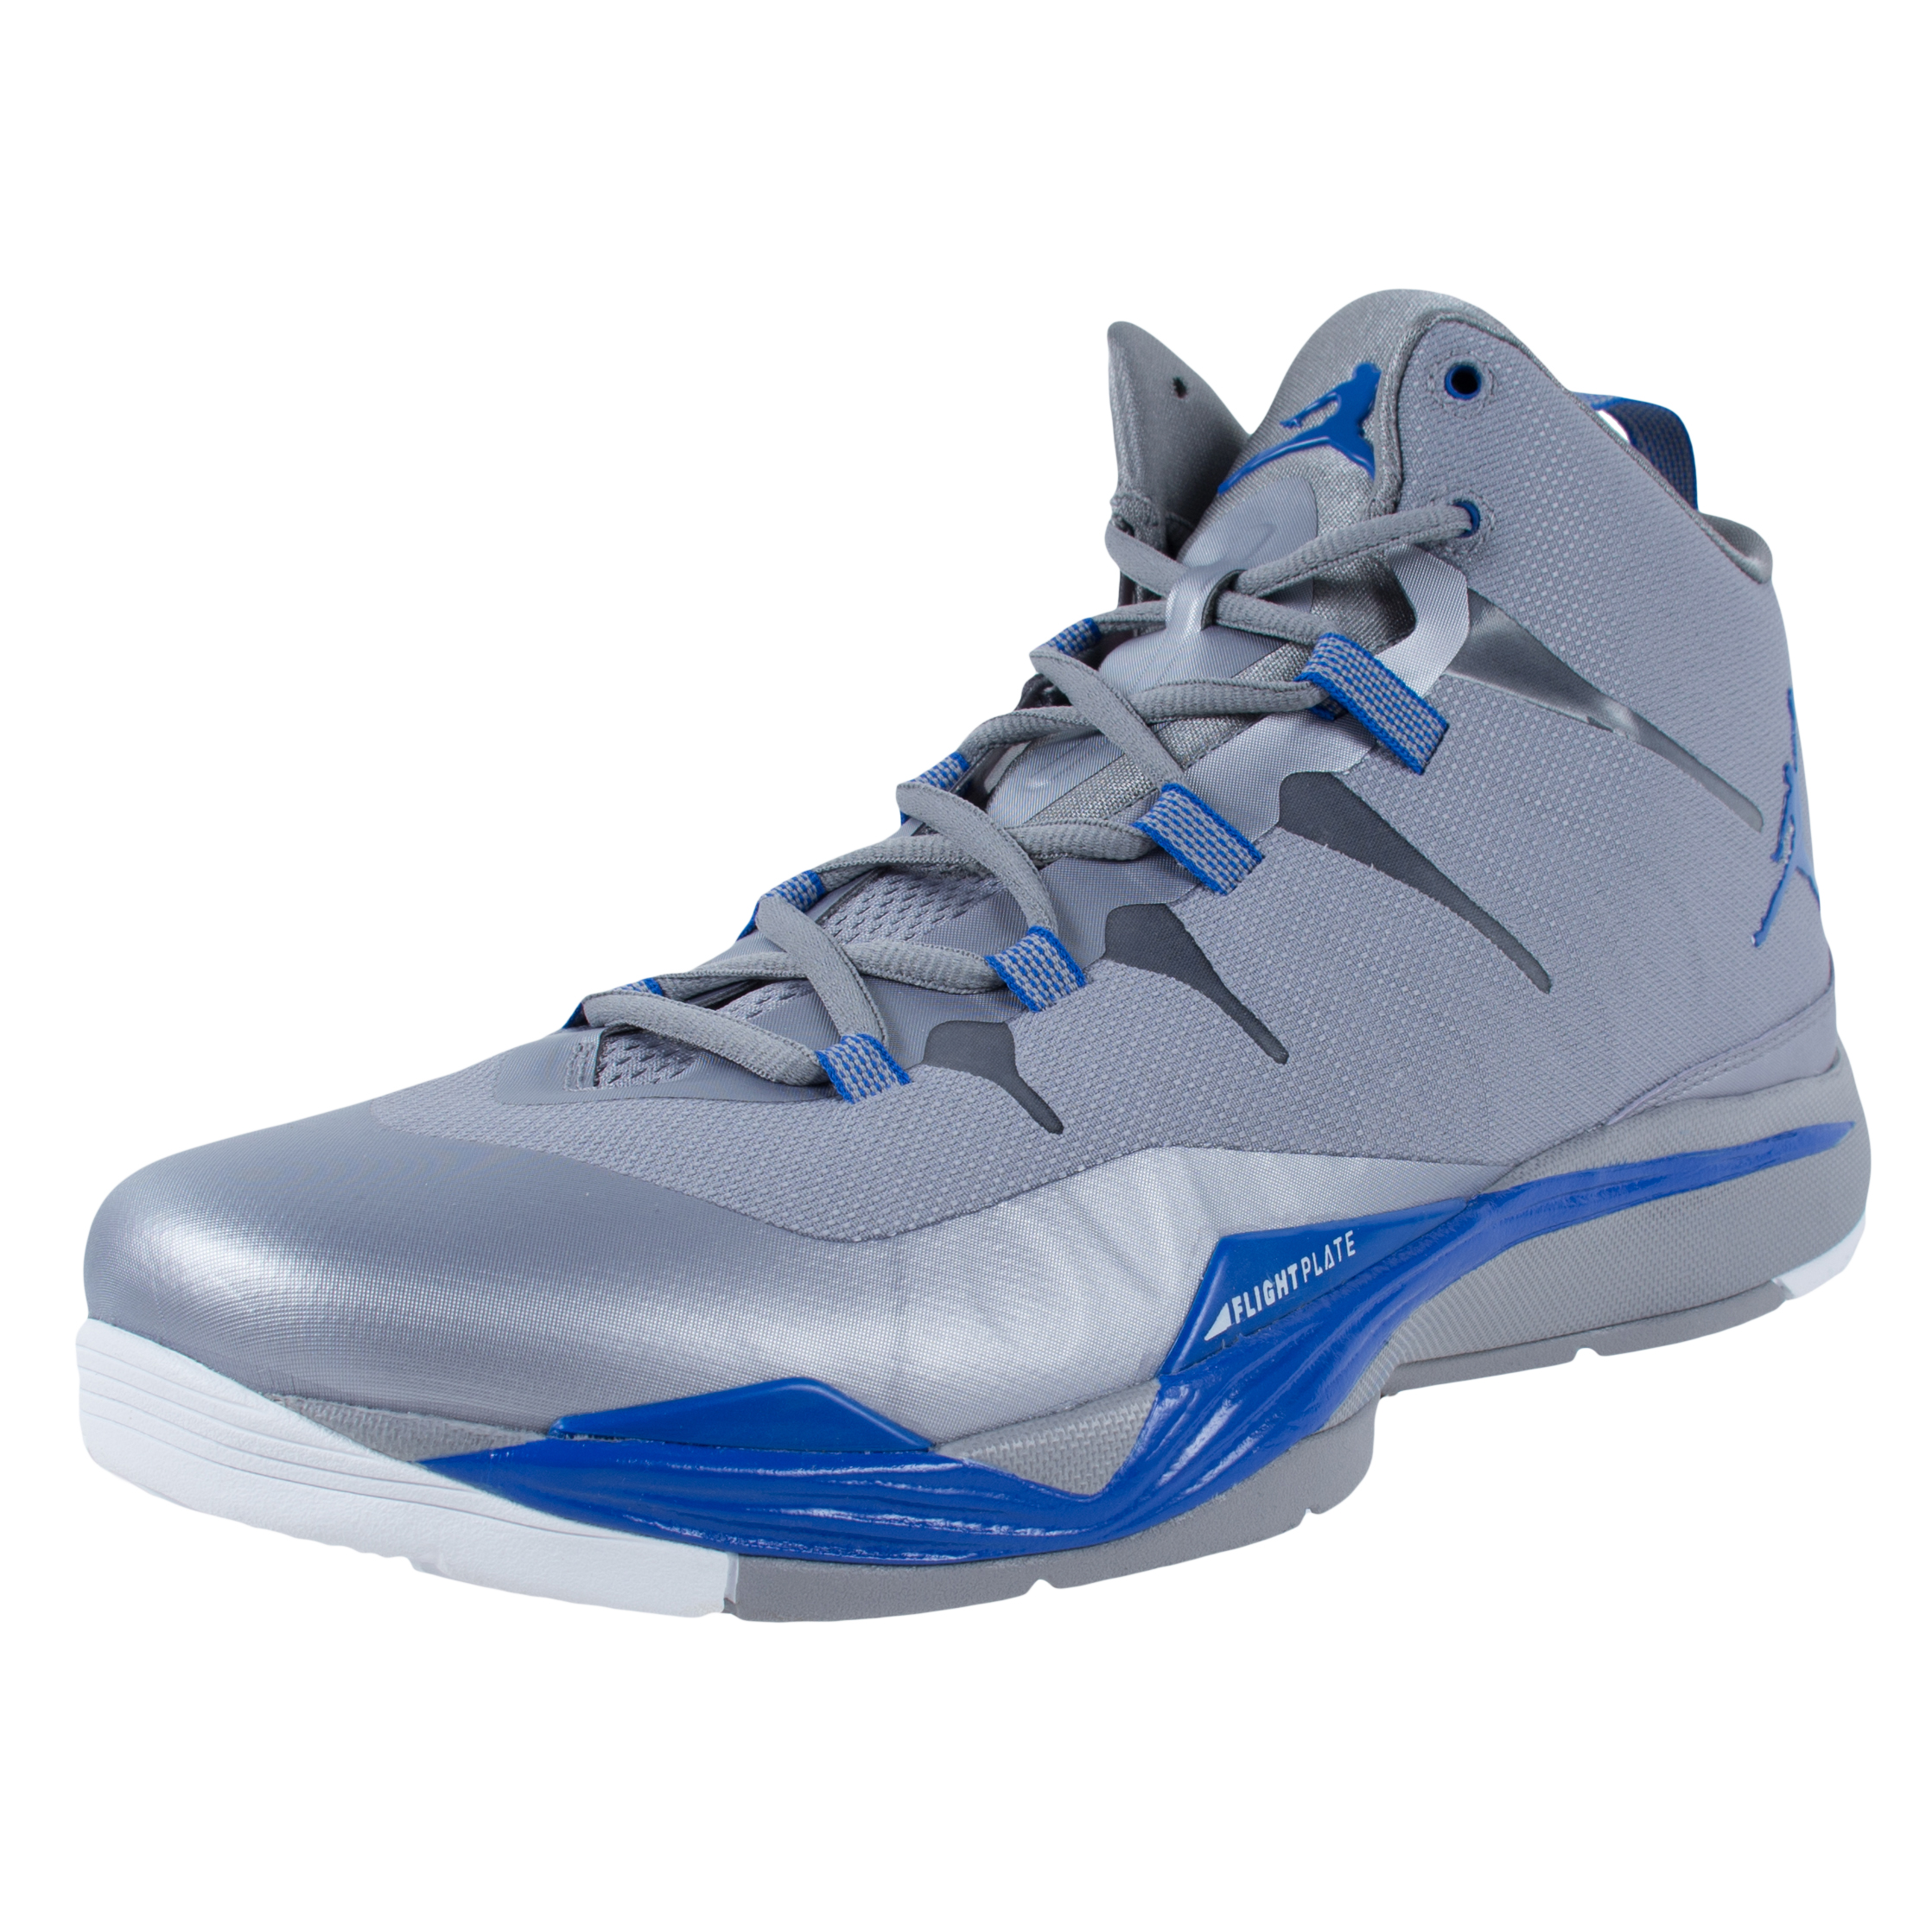 NIKE JORDAN SUPER.FLY 2 BASKETBALL SHOES CEMENT GREY BLUE 599945 007 SIZE  13 - Walmart.com